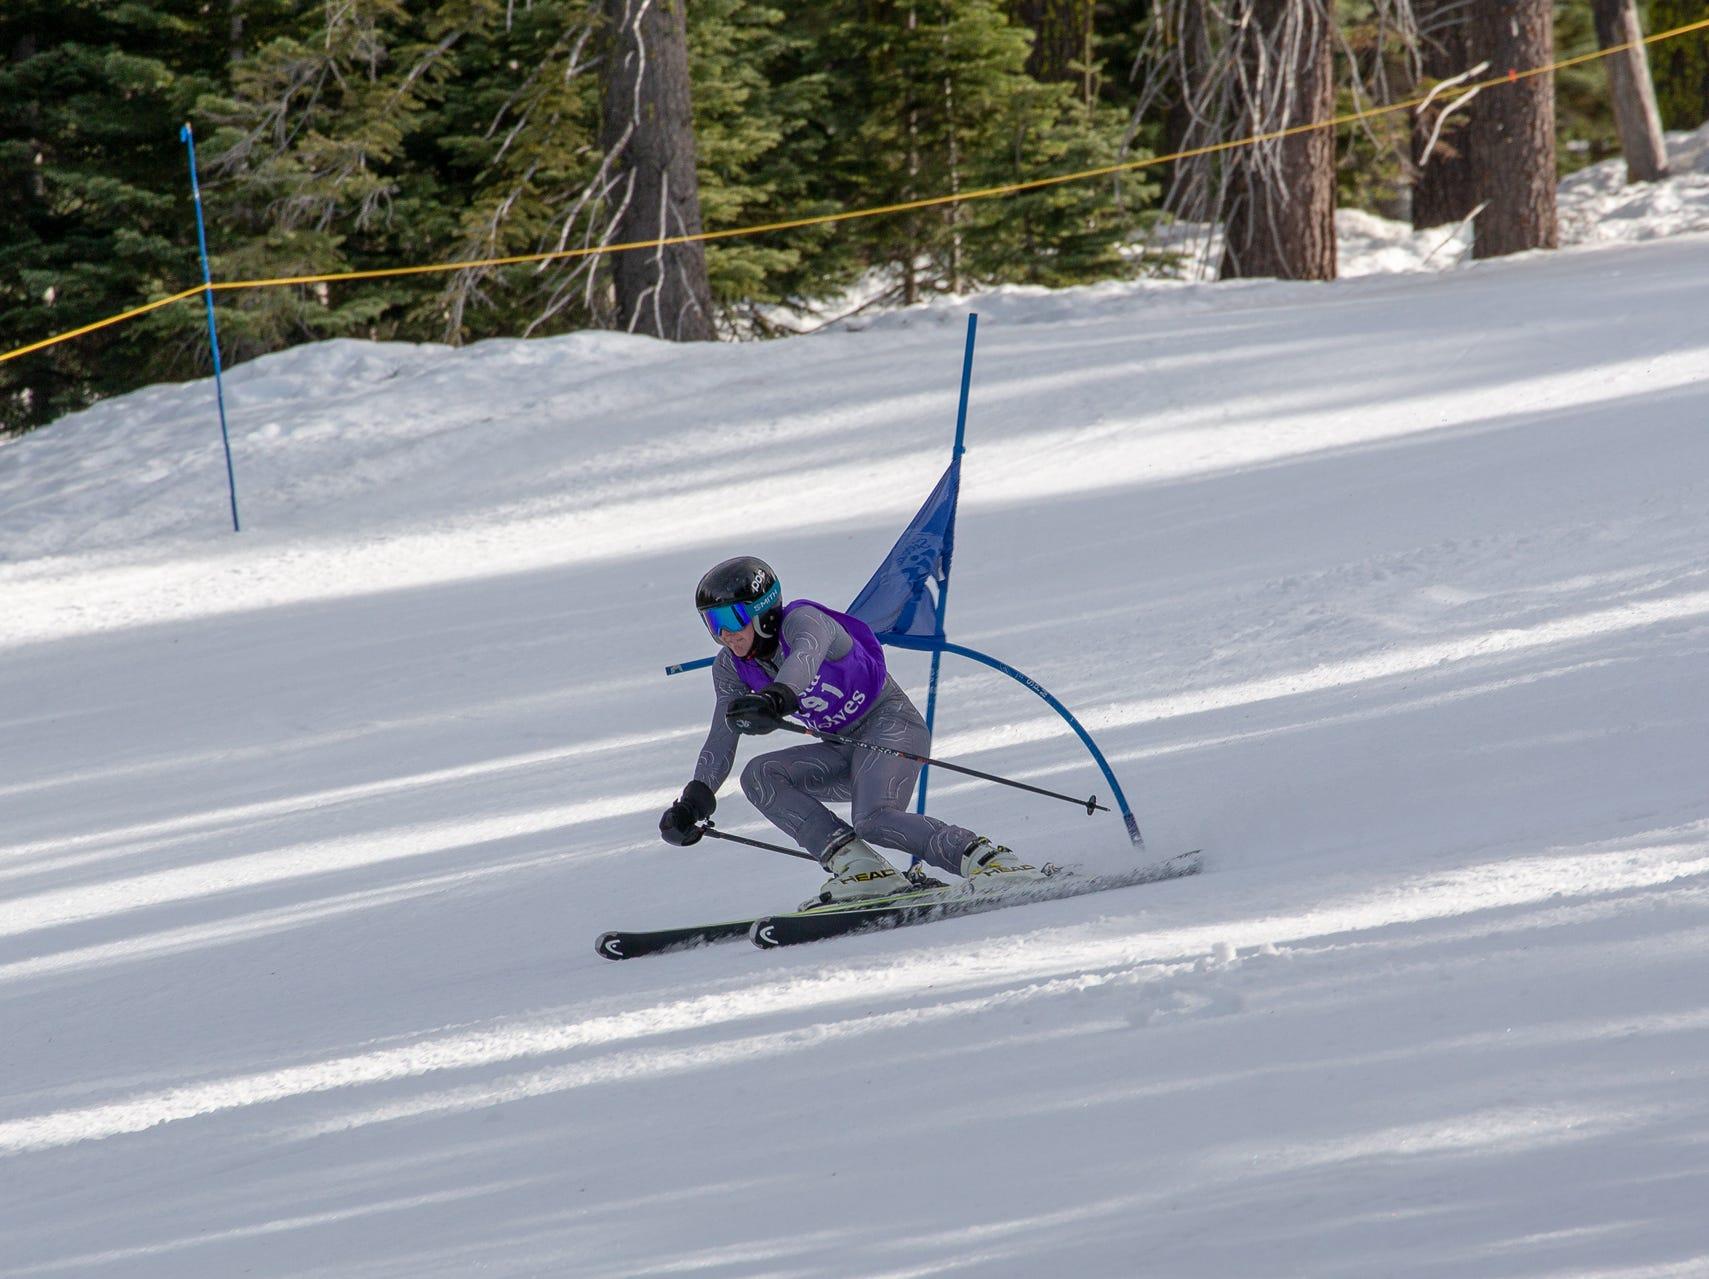 Blake Blomquist of Shasta races in the third high school ski meet of 2019 on Monday, Jan. 28 at Mt. Shasta Ski Park.